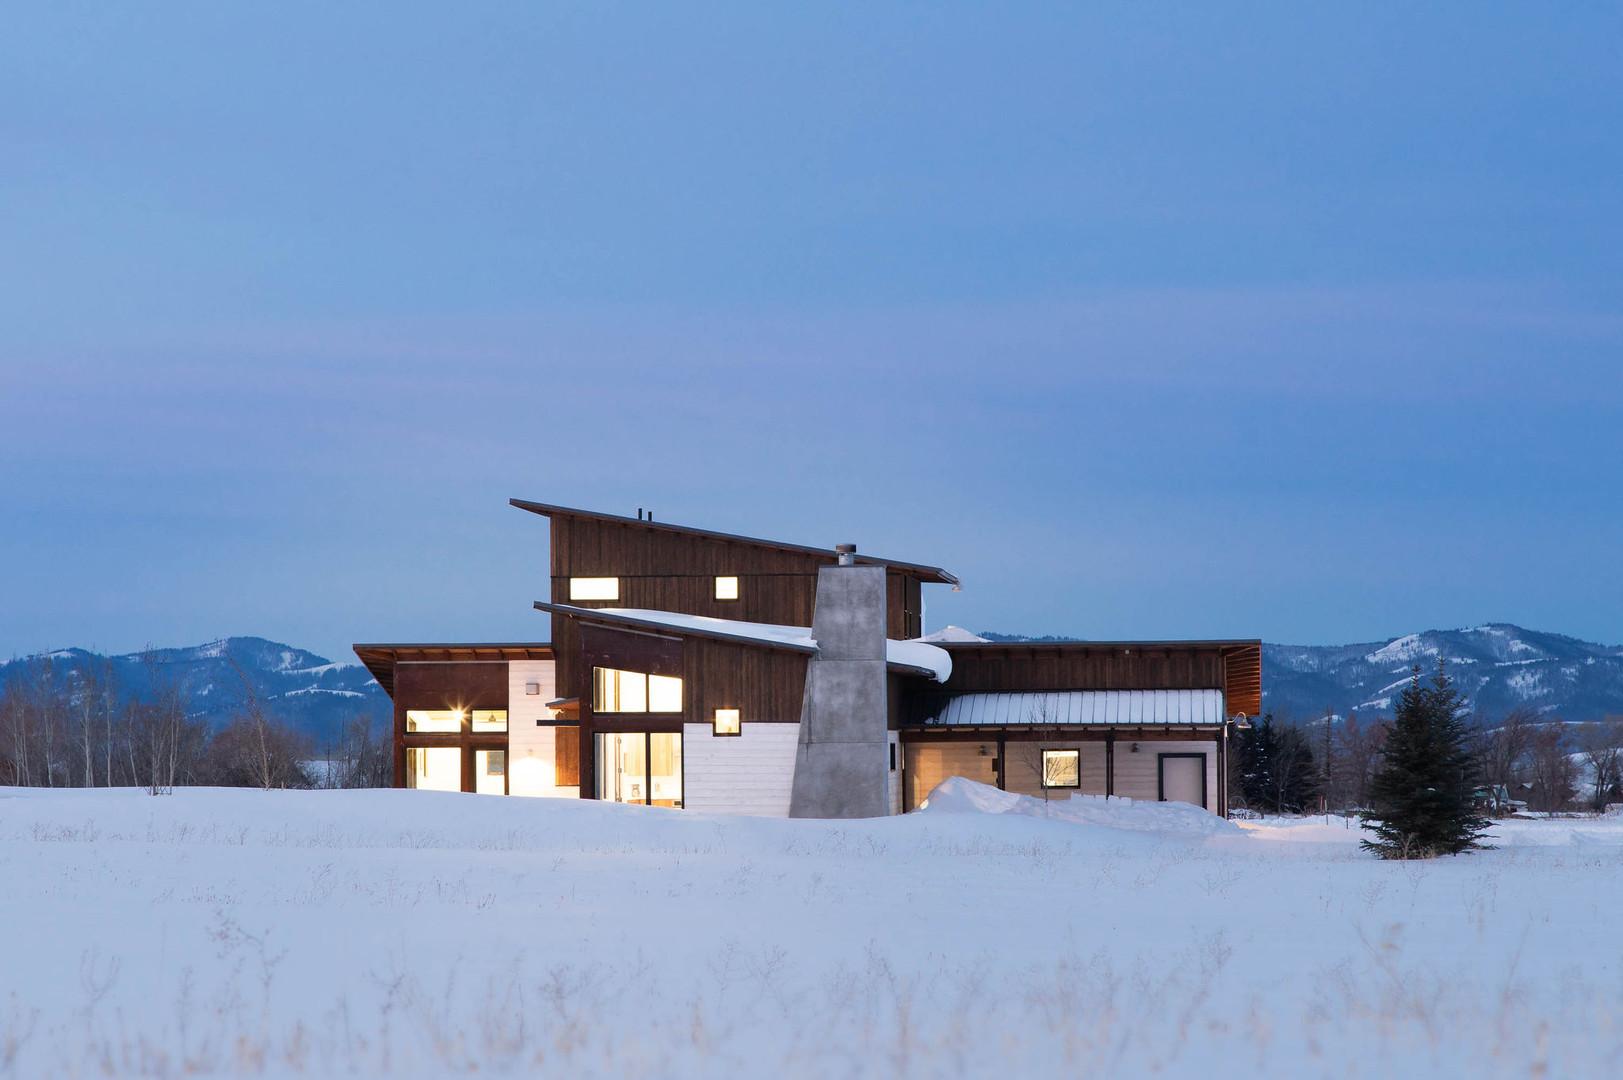 Teton_retreat_mountain_home_Megan Hanson